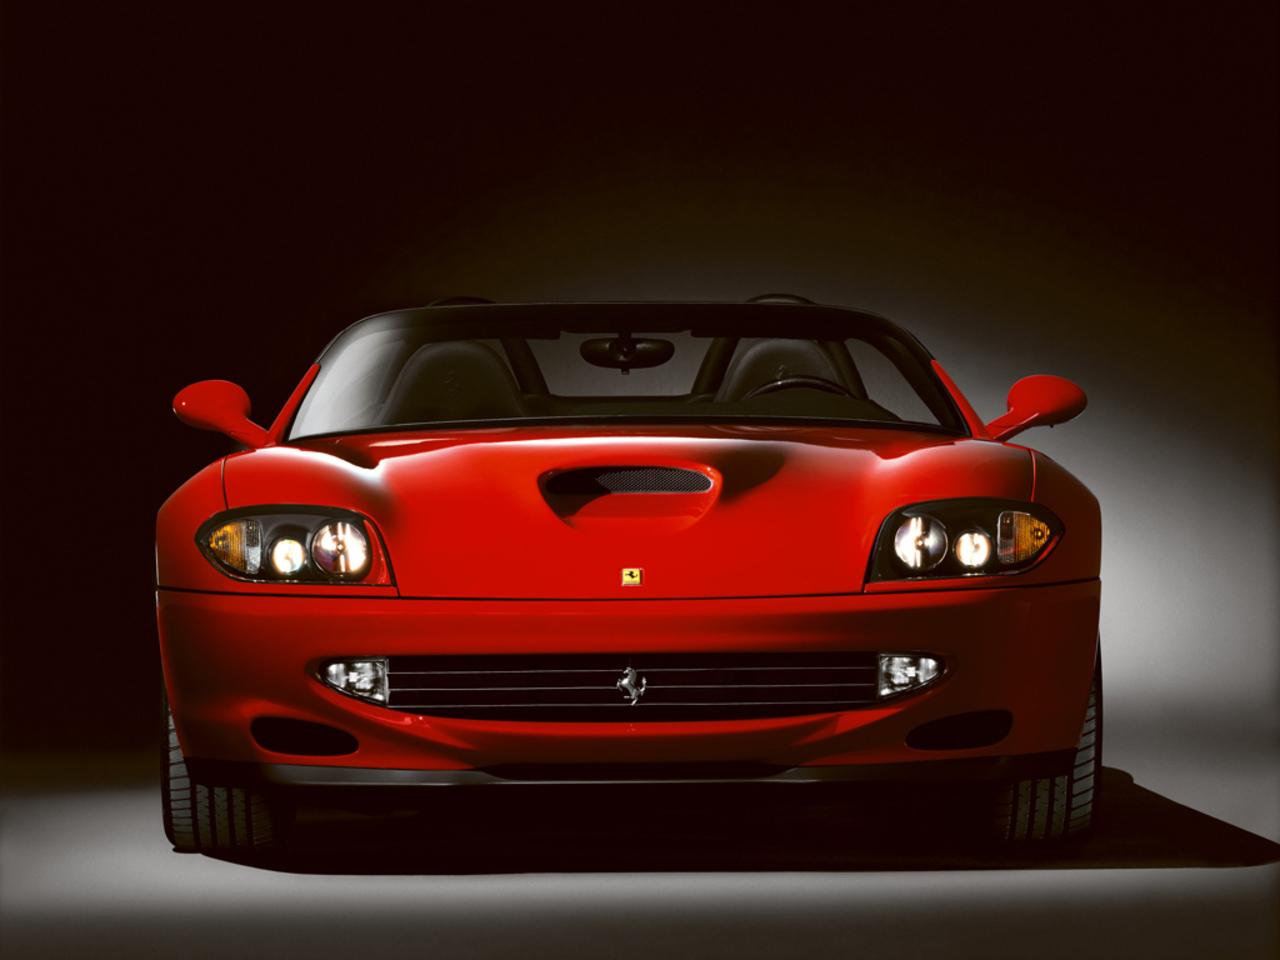 550 Barchetta Pininfarina: Front view